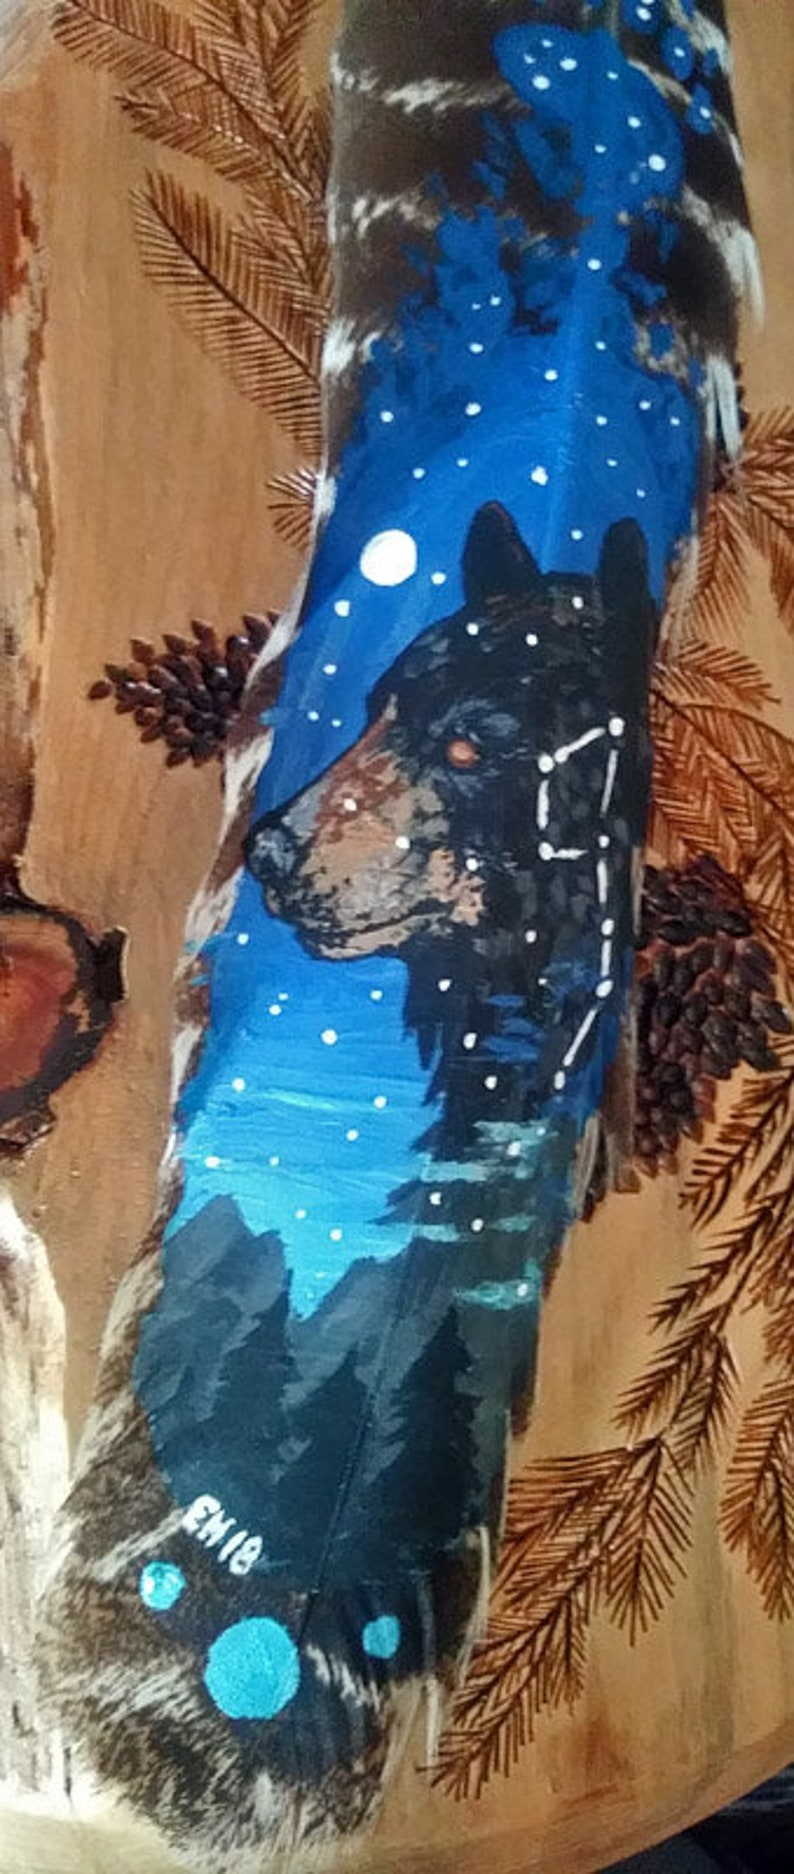 4fd8d2fb6ee05 Ursa Major Black Bear Original Feather Painting Constellation Star  Wilderness Forest Nature Art Gift